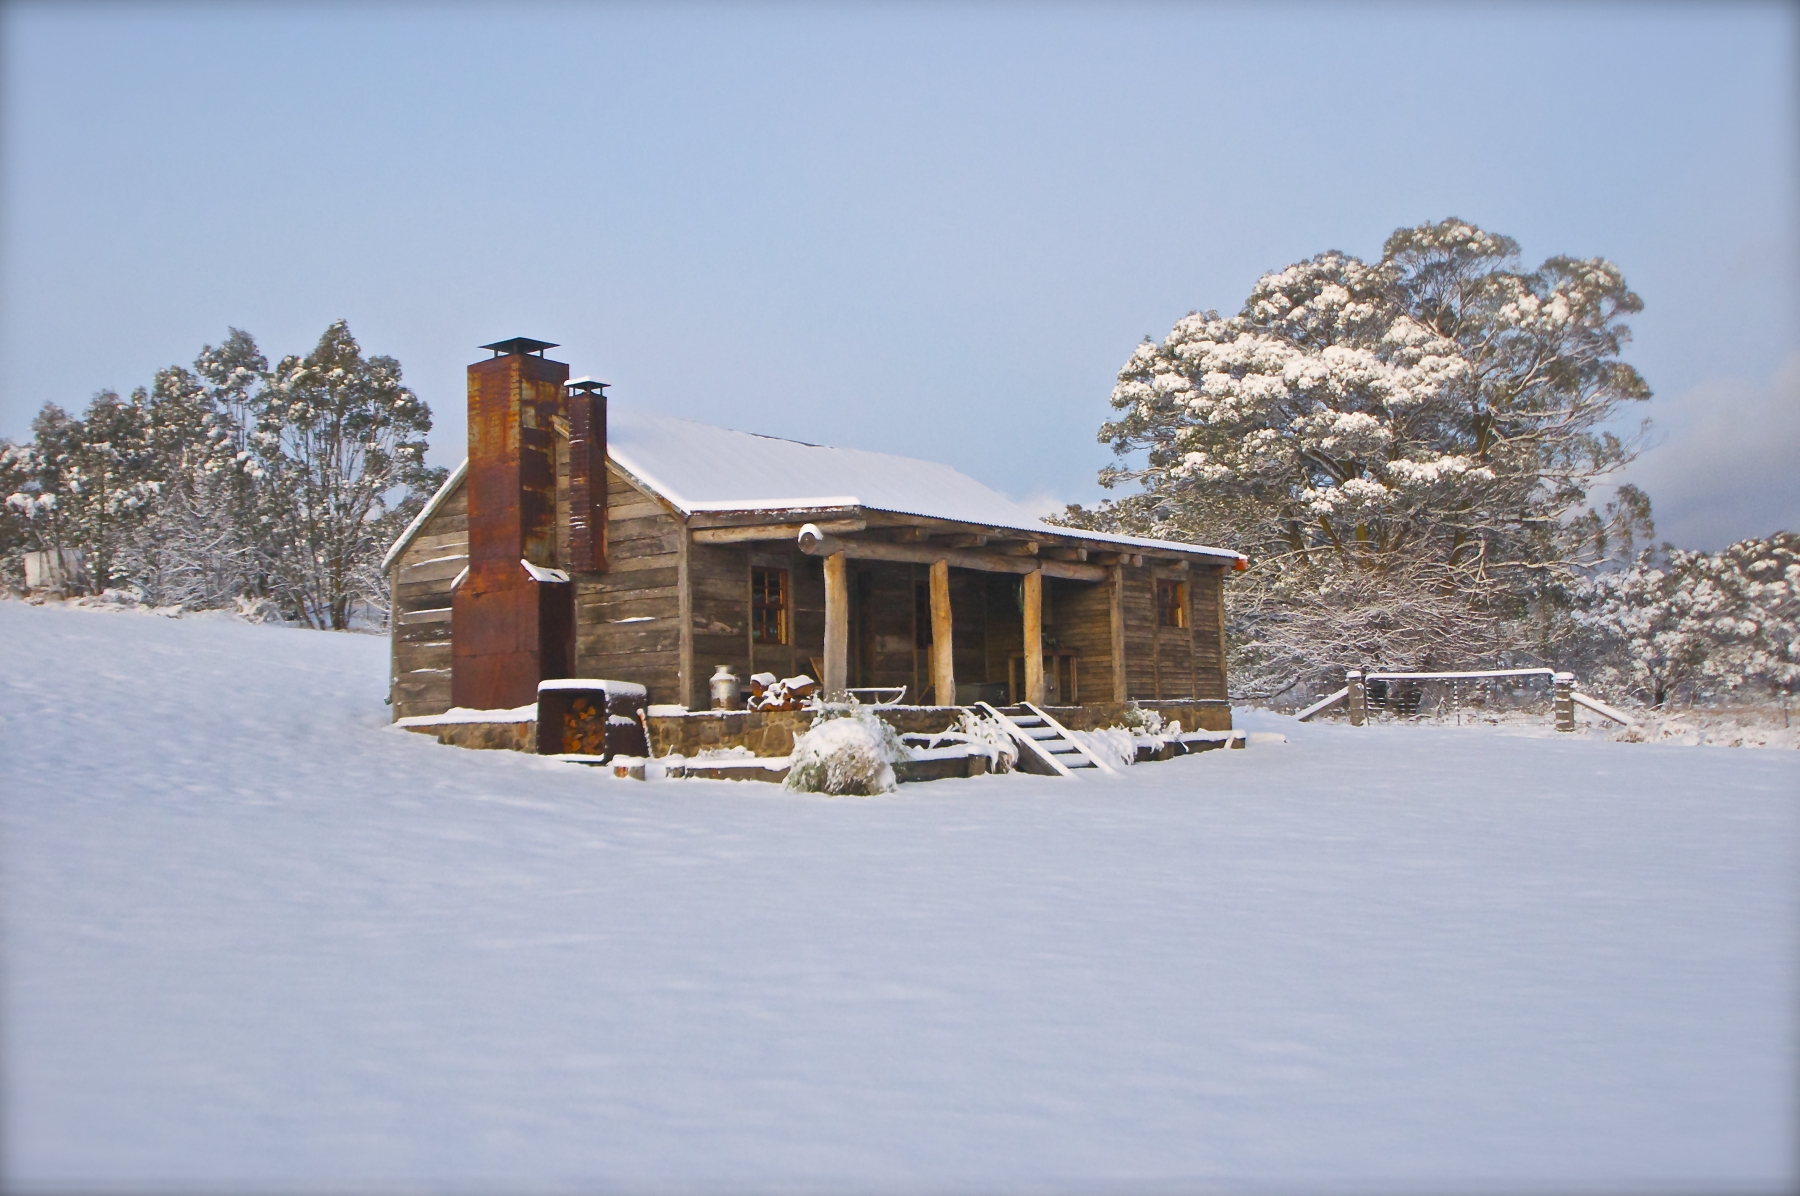 Moonbah River Hut in Winter